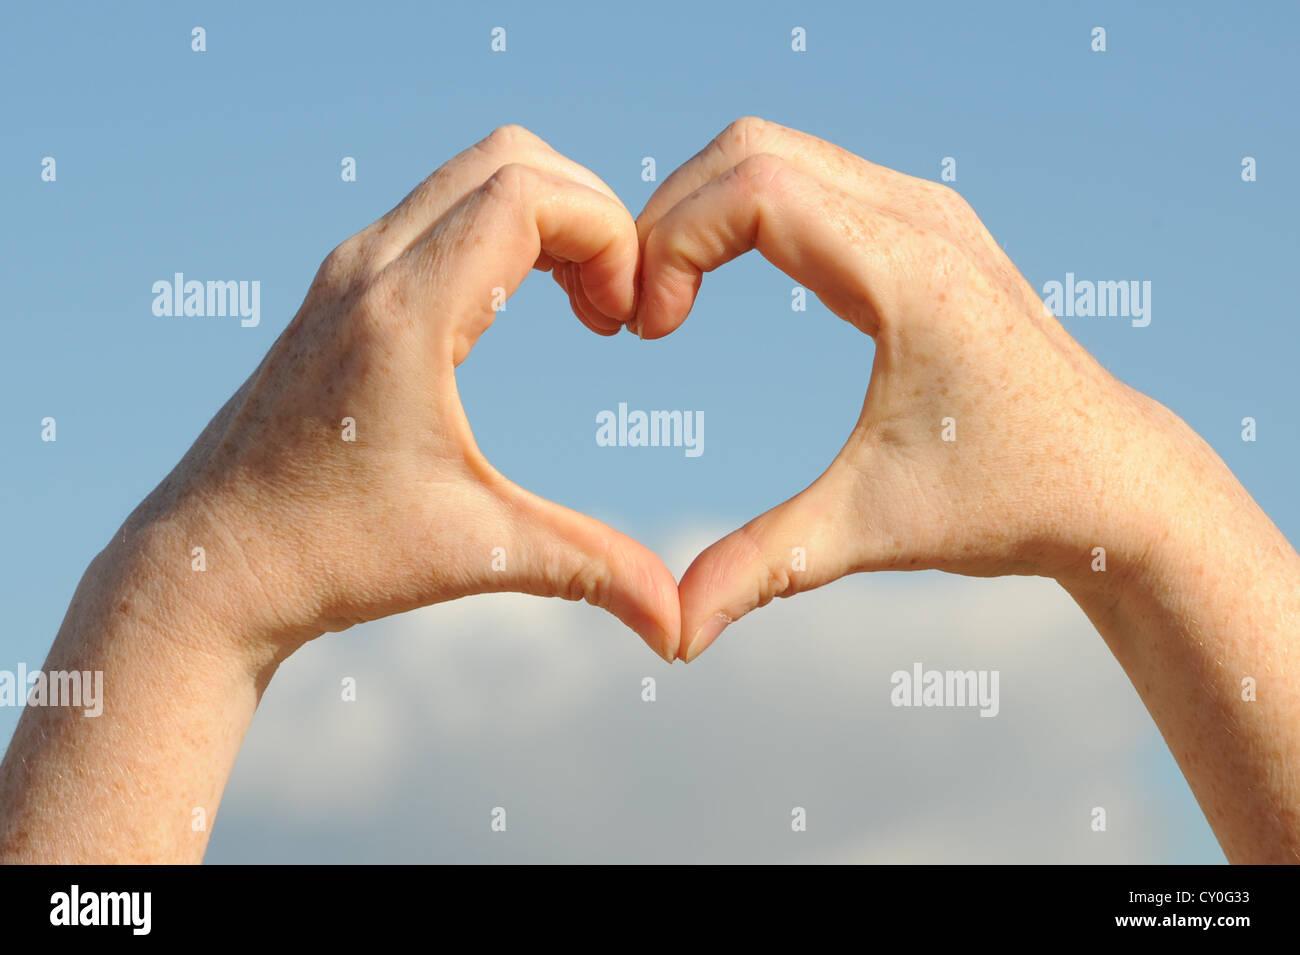 heart shaped hands Stock Photo: 51029079 - Alamy